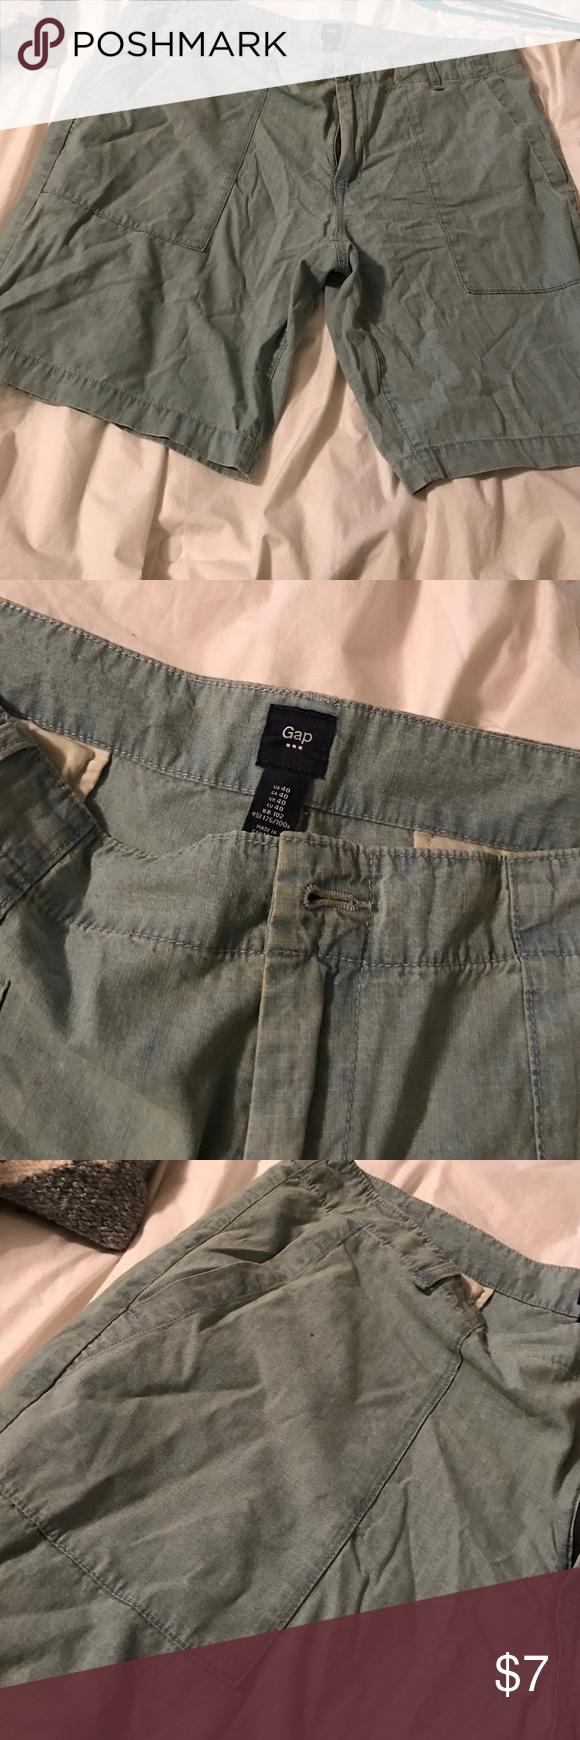 Gap light denim shorts 40 Gap light denim men's shorts 40 used GAP Shorts Flat Front